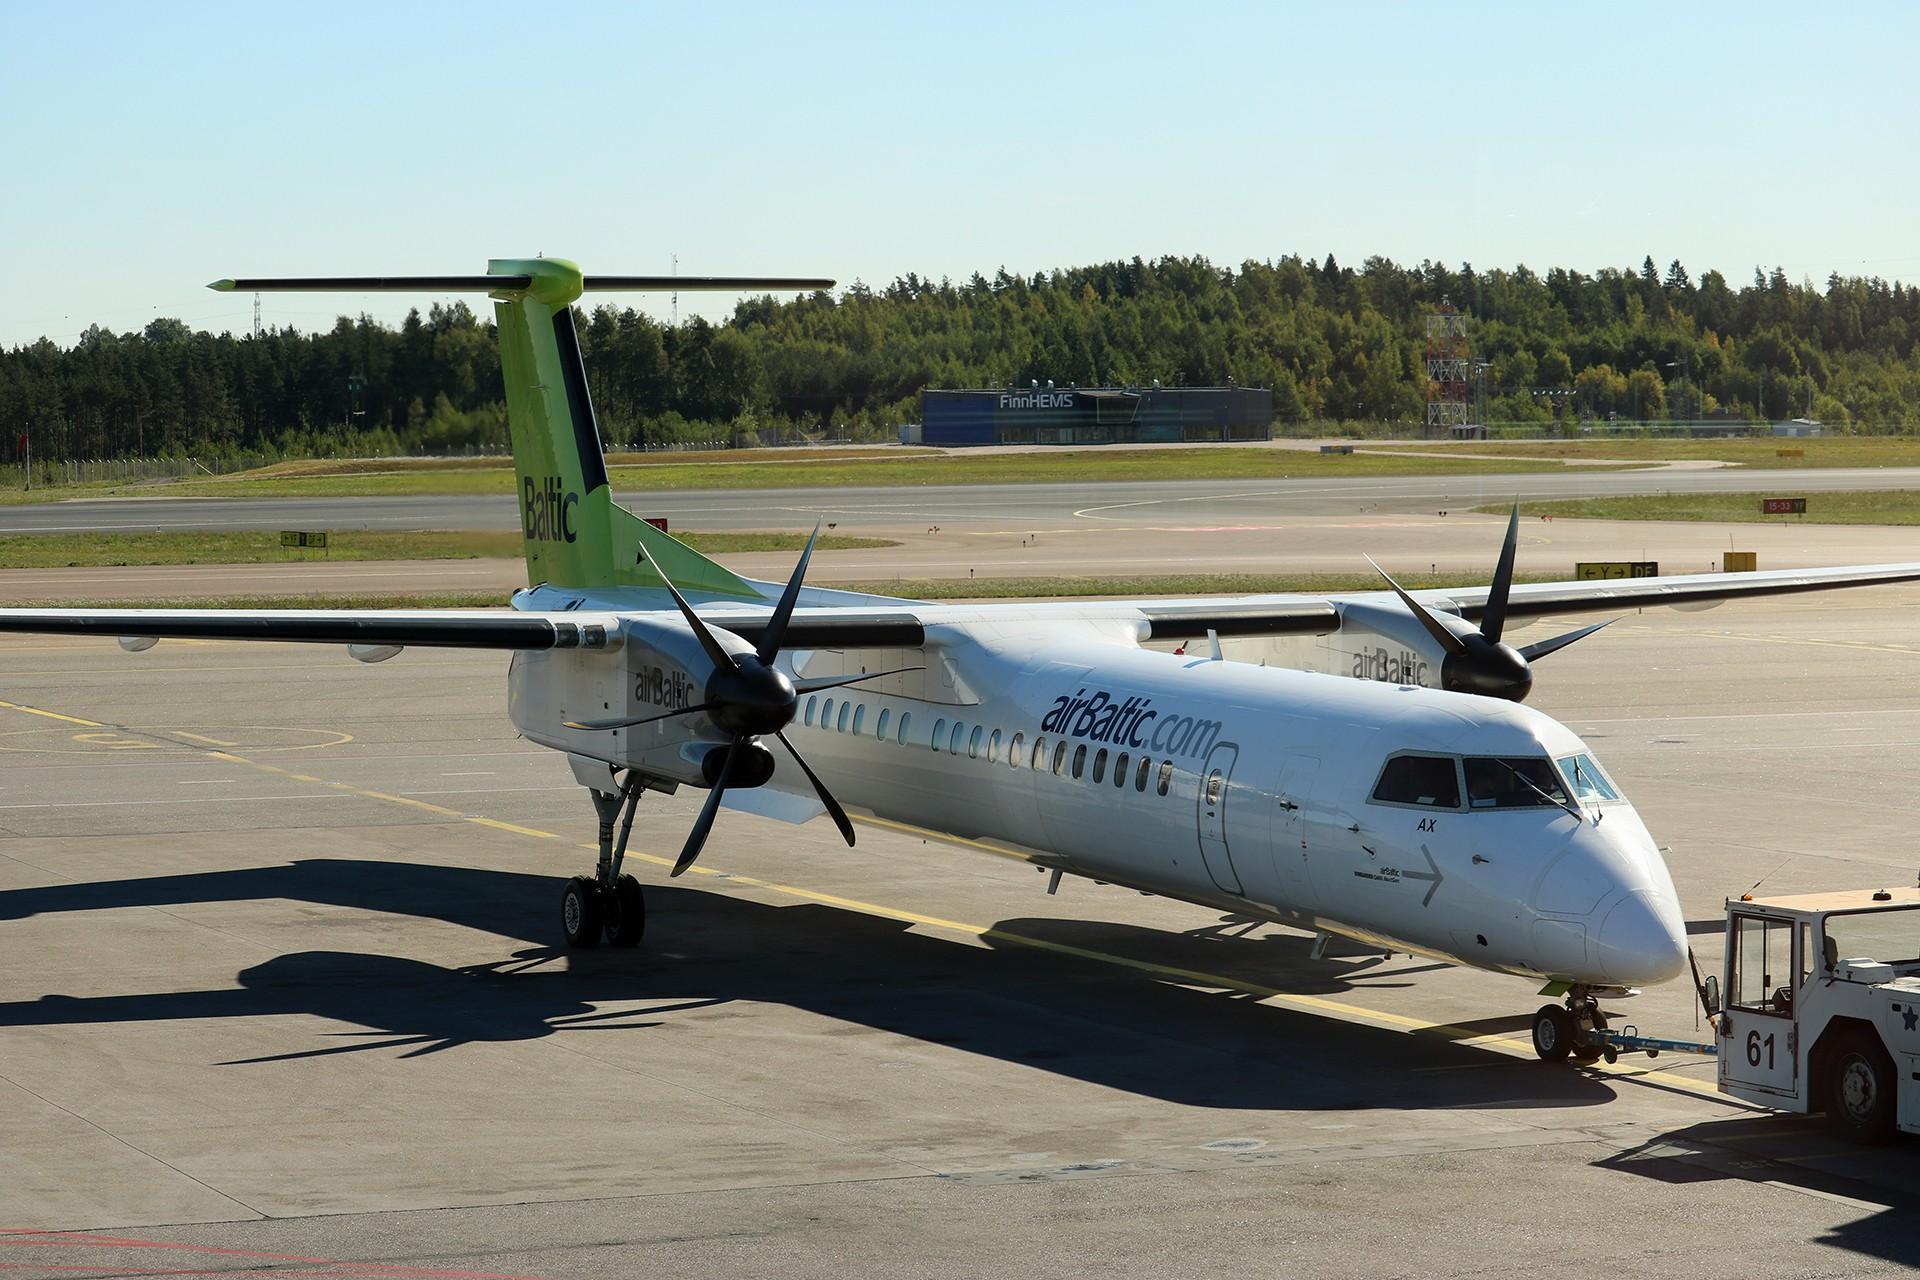 Re:[原创]LIULIU|一天两种机型三个国家四段航线五座城市的回家之路|西伯利亚上空的星光 DE HAVILLAND CANADA DHC-8-400 YL-BAX 芬兰赫尔辛基-万塔机场